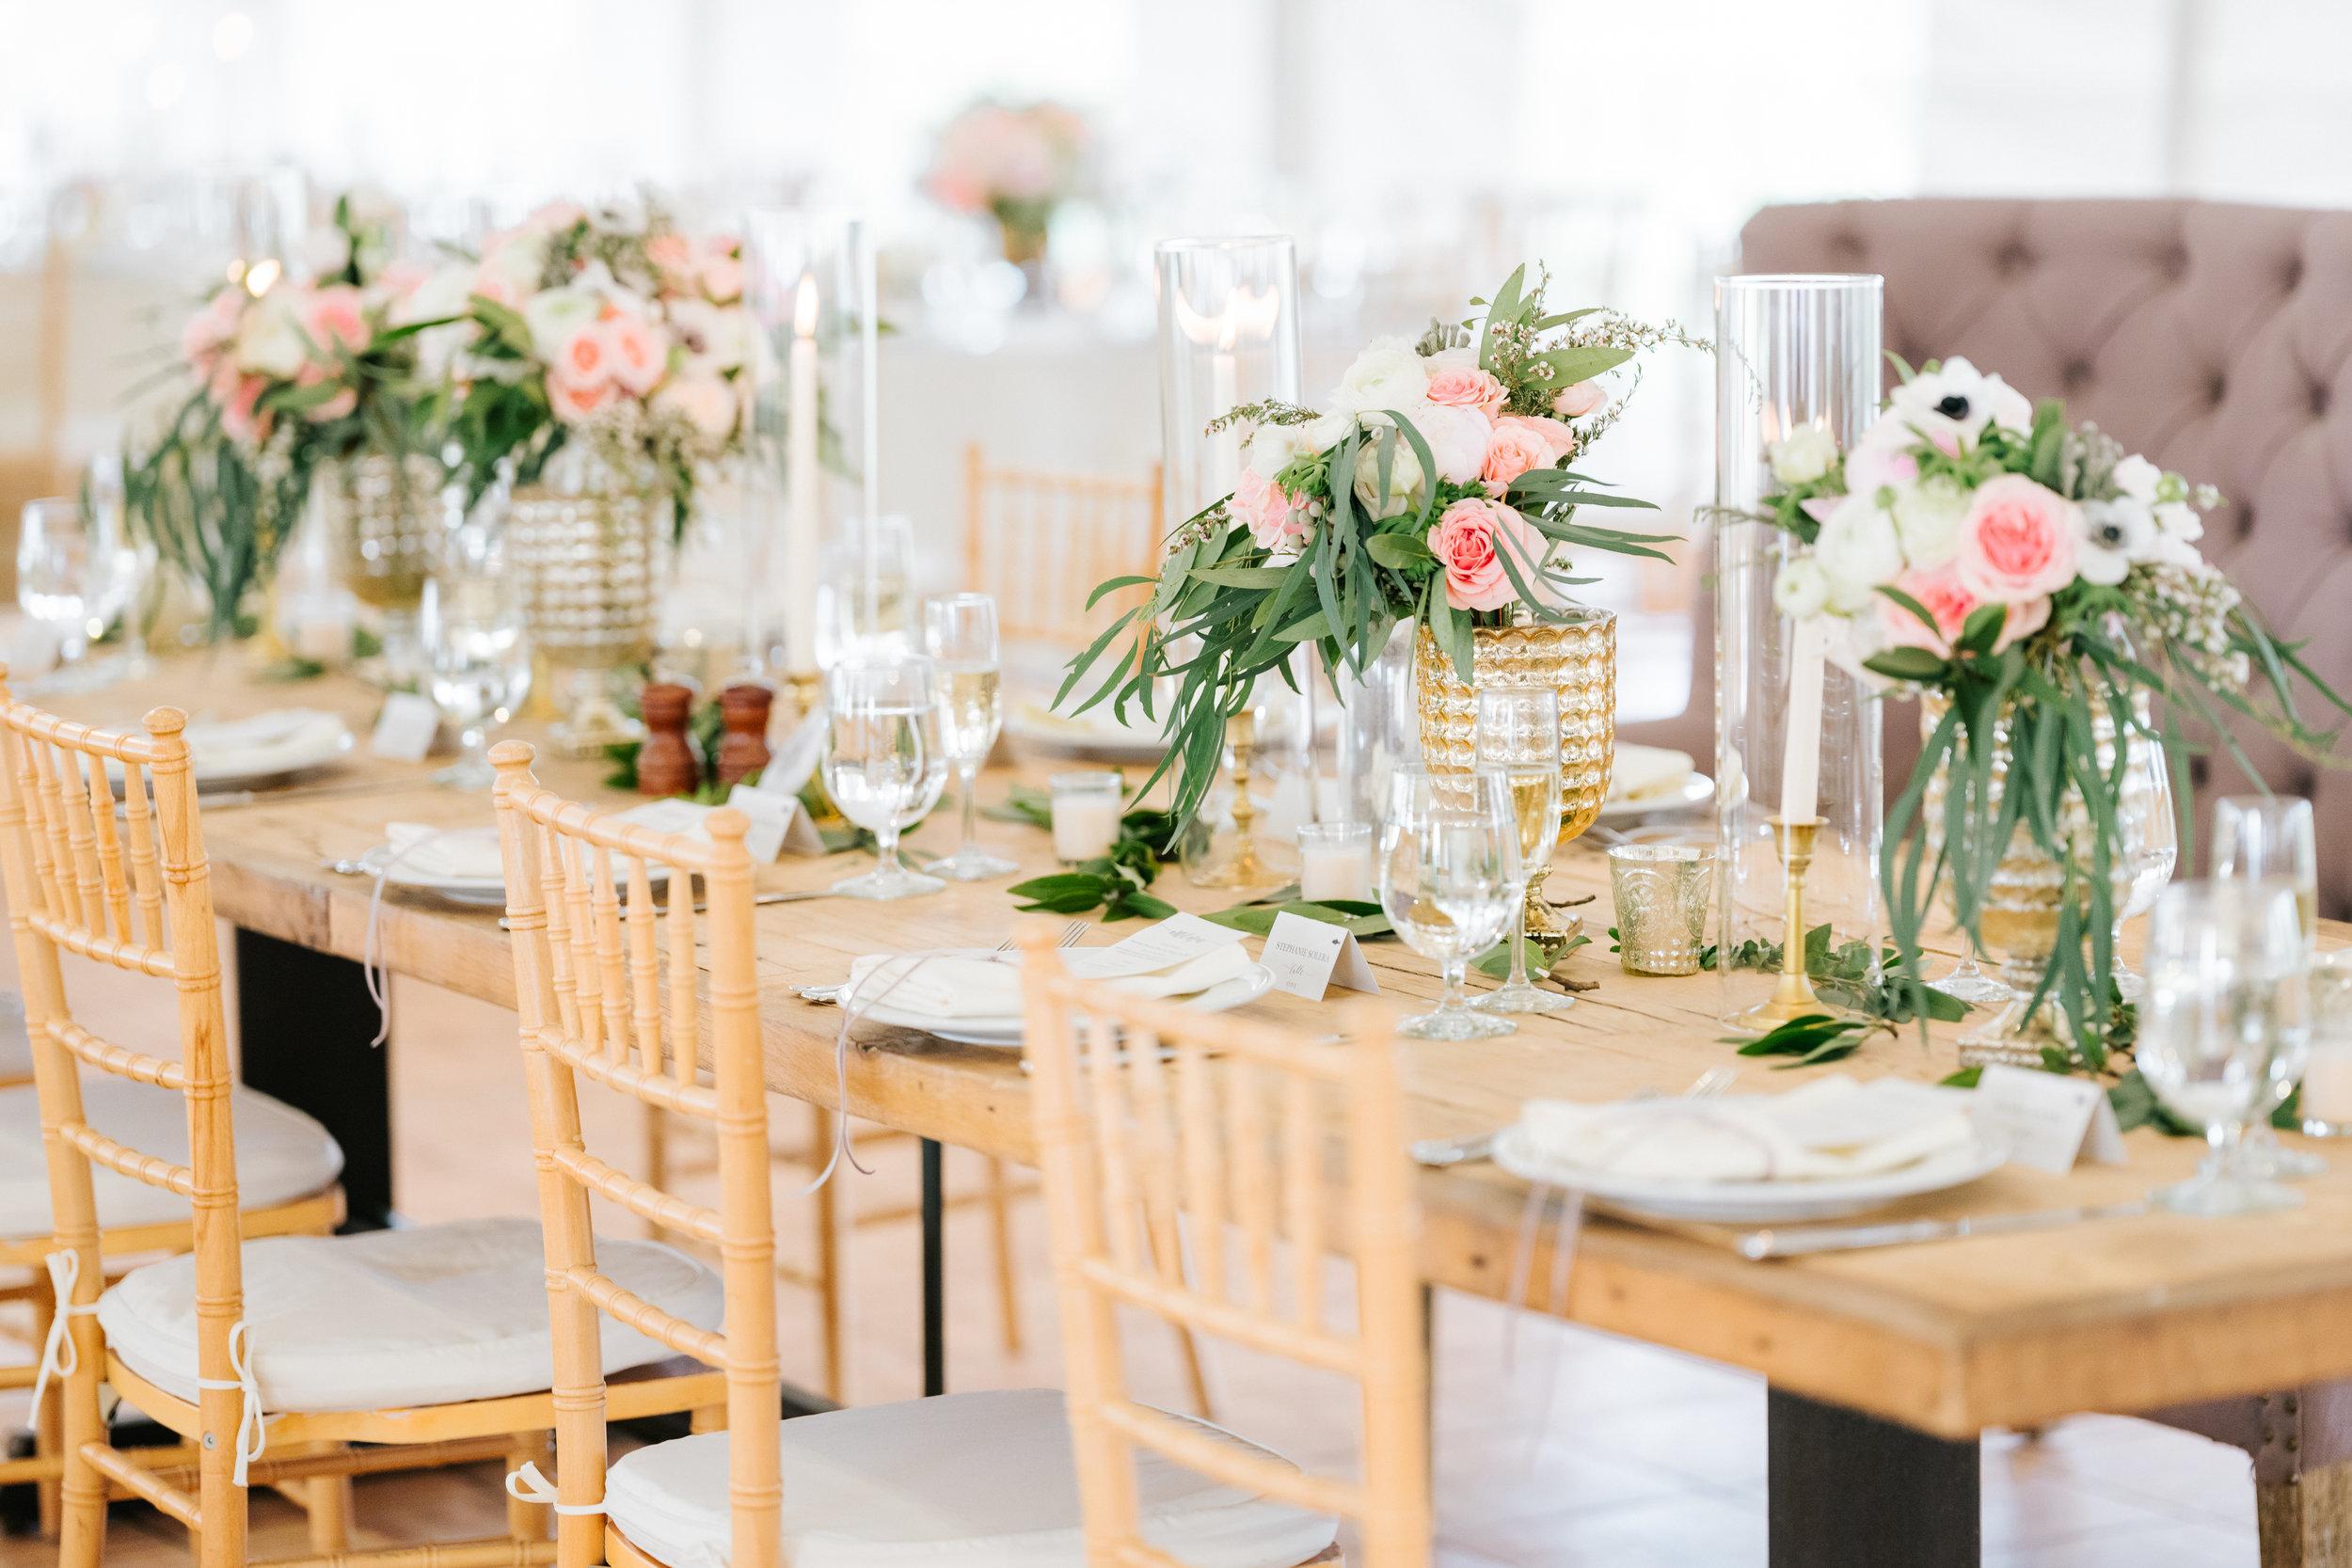 Blush Wedding Head Table at Zingerman